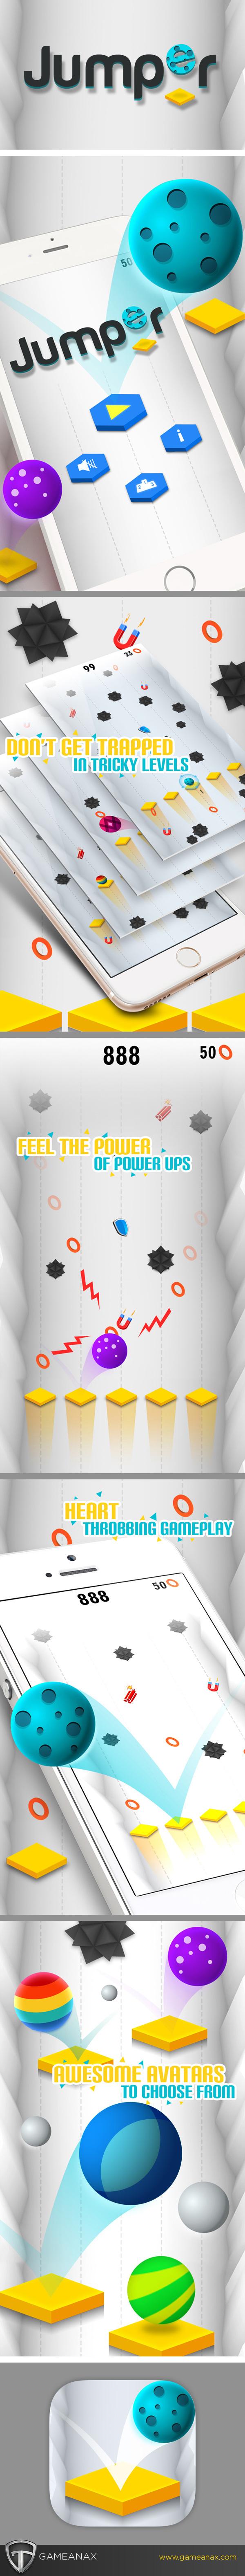 UI ux gamedesign Games ios android graphics Buildbox design art